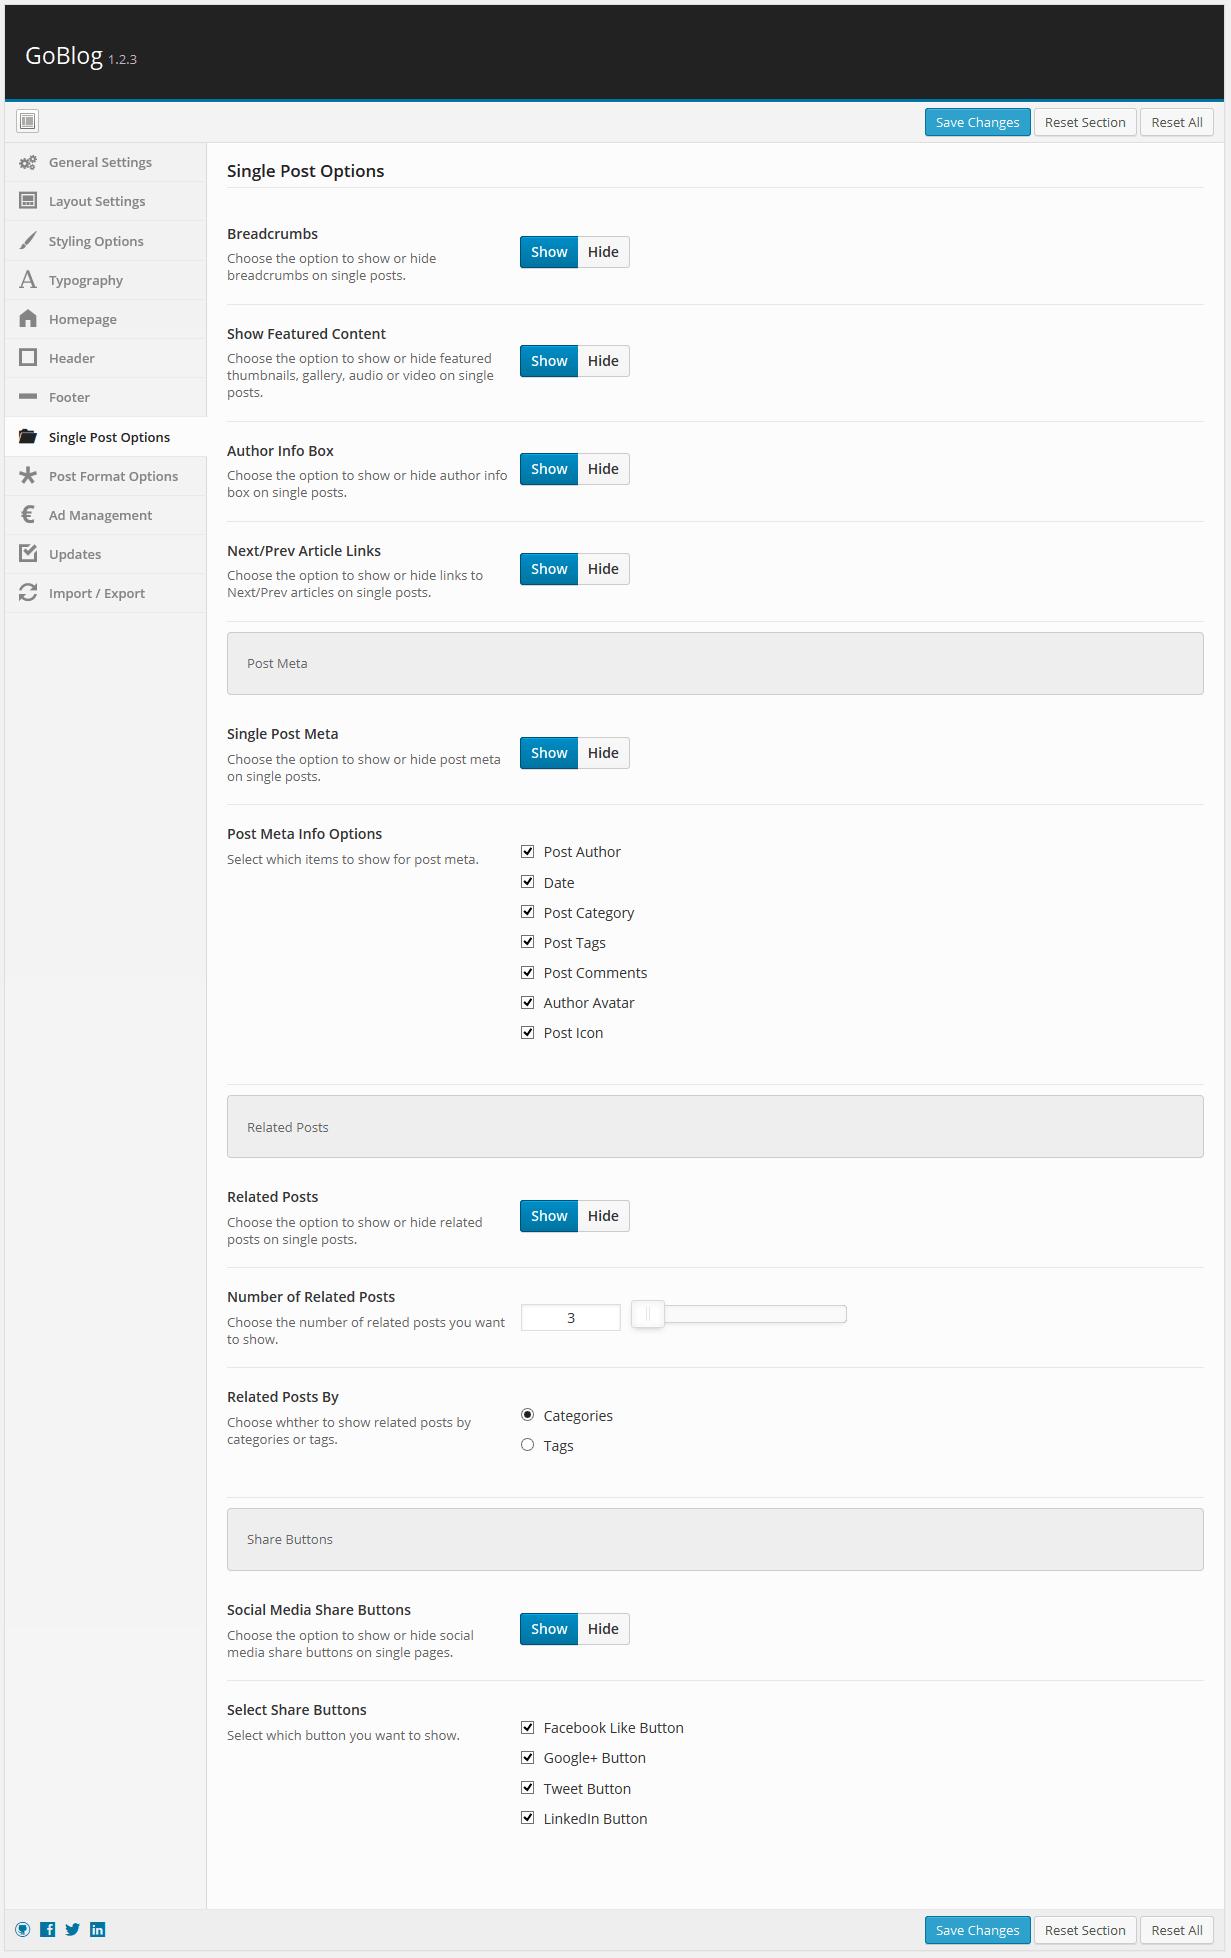 Single Post Options